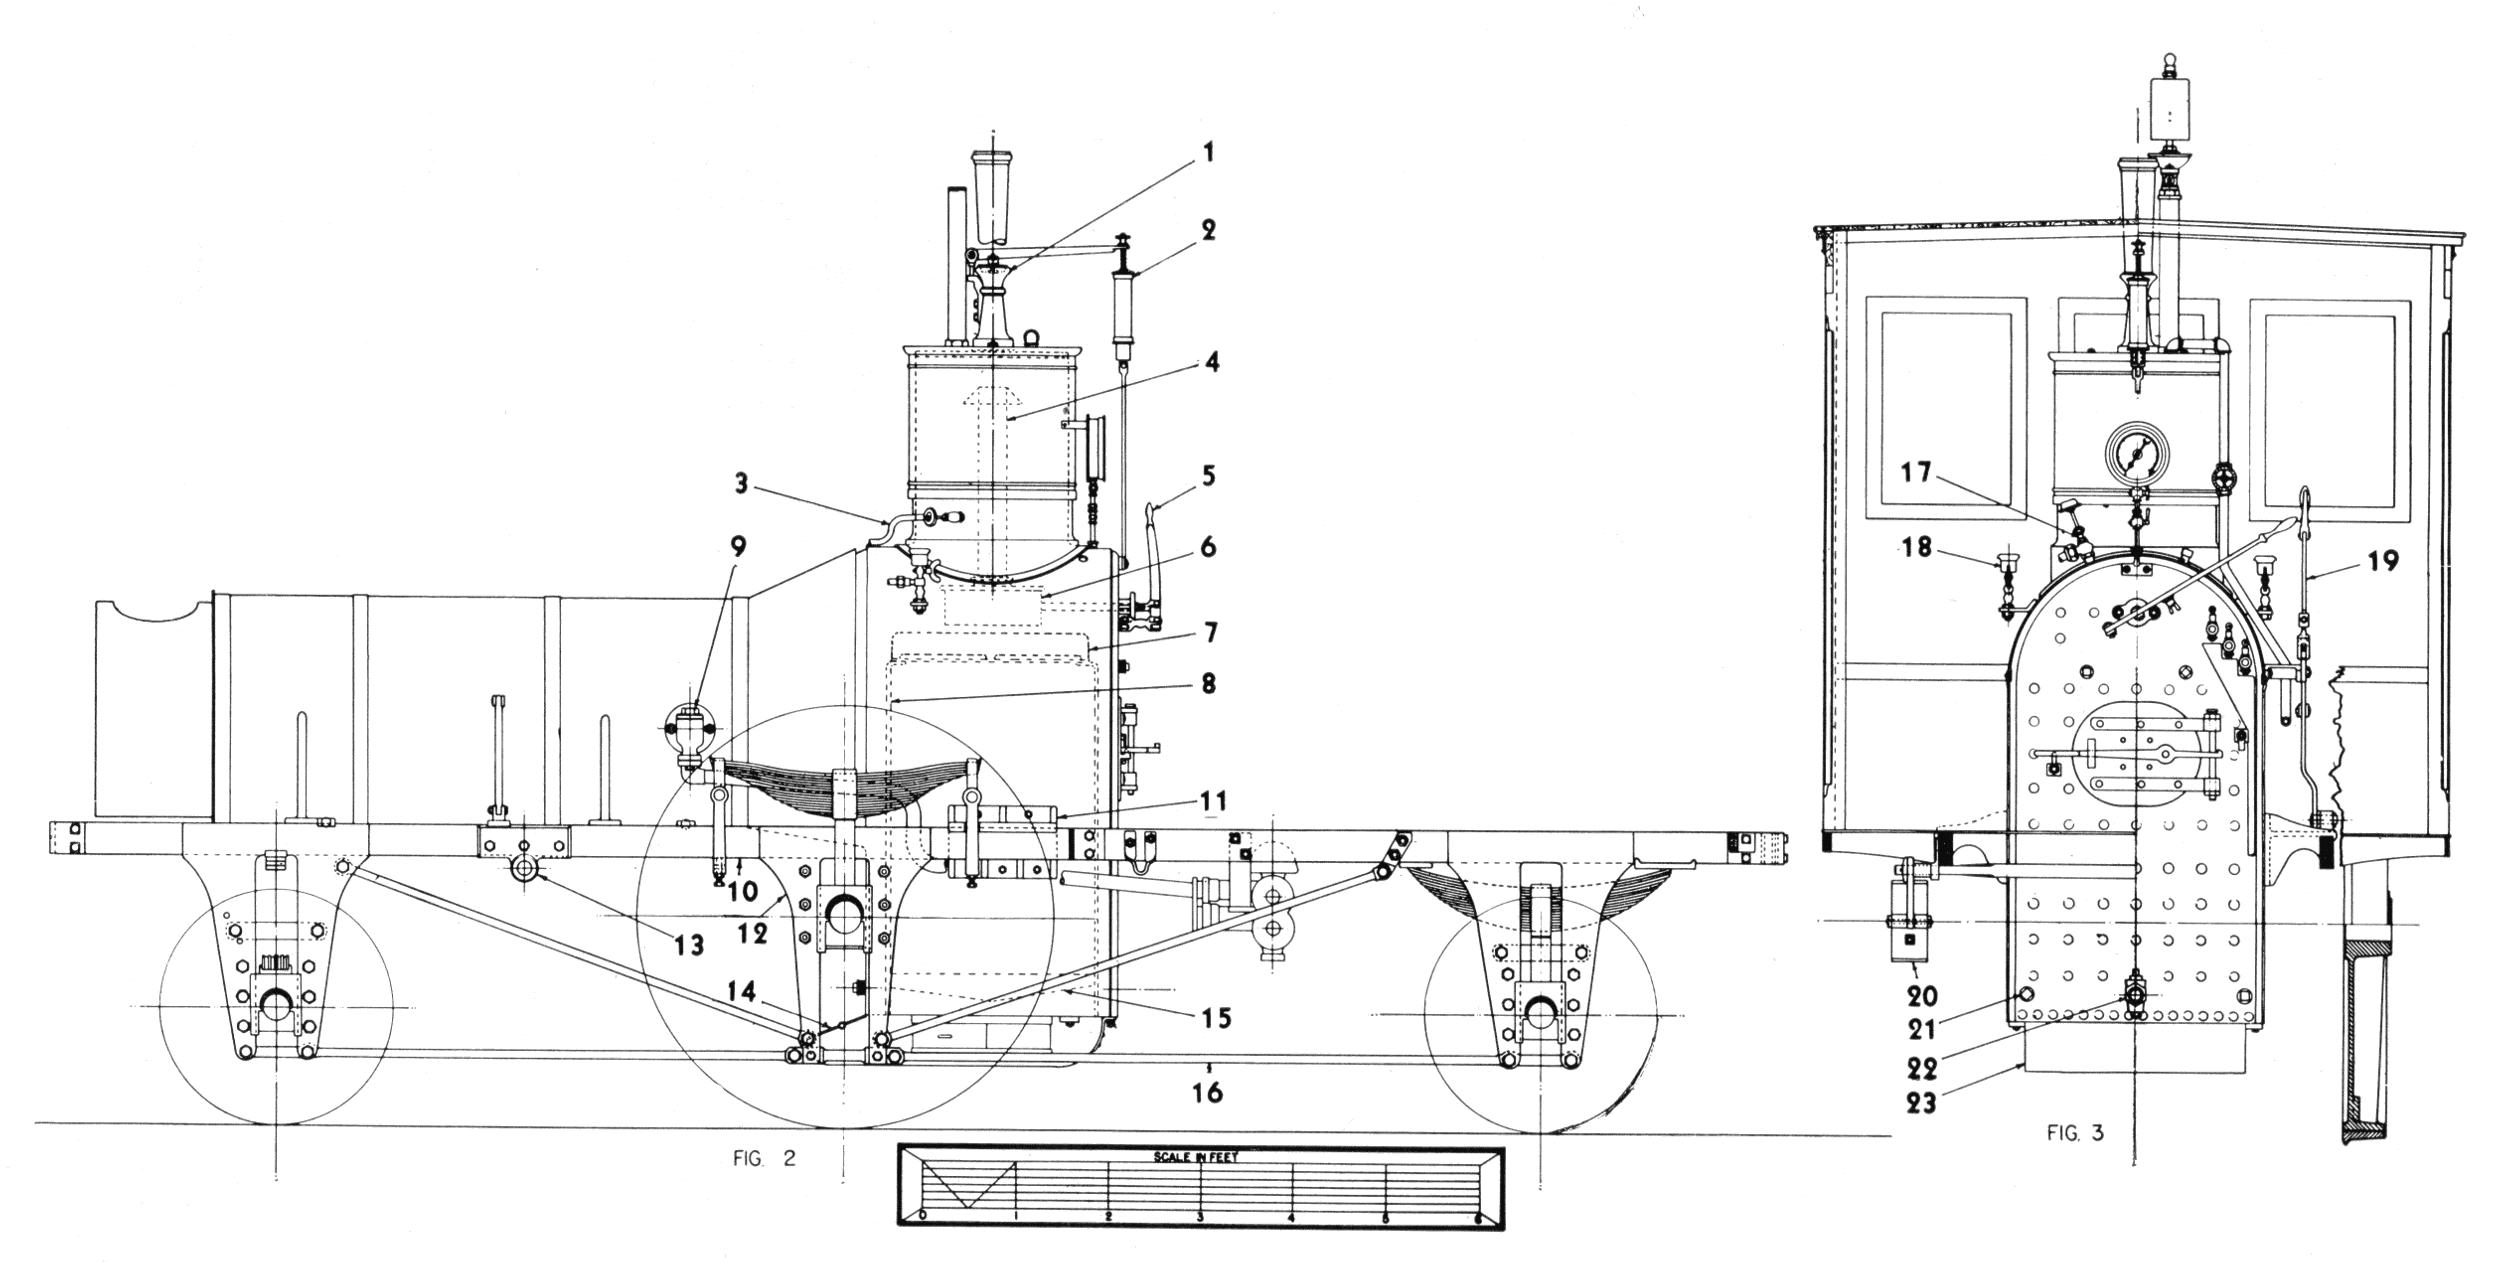 The Project Gutenberg Ebook Of Pioneer Light Passenger Simple Steam Engine Besides Diagram On Figure 18pioneer Locomotive